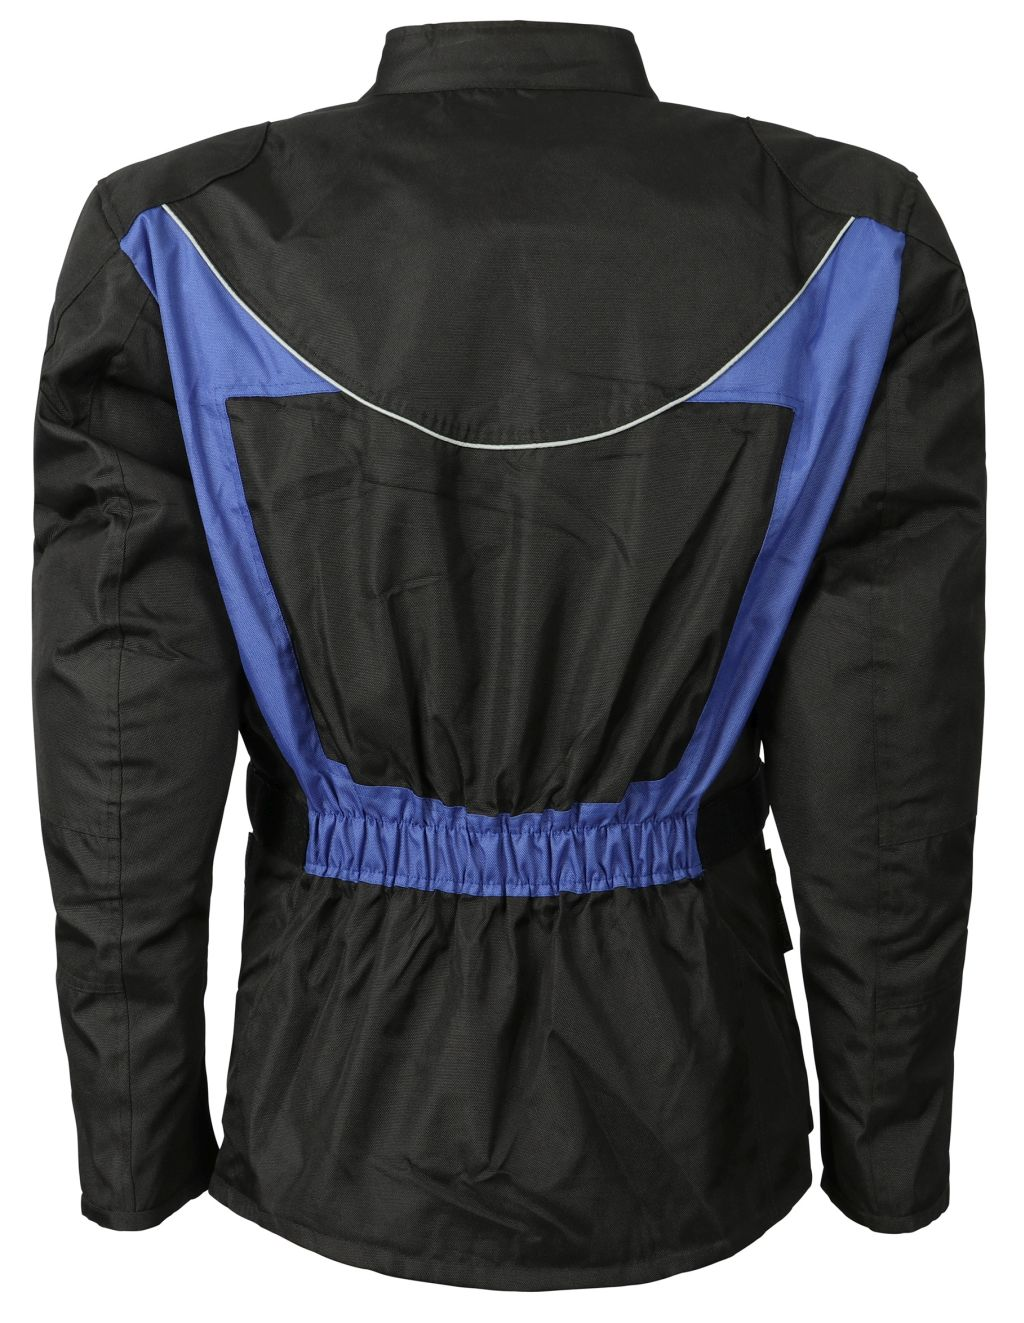 Bangla Motorrad Jacke Textil Motorradjacke Cordura Blau schwarz S - 8 XL